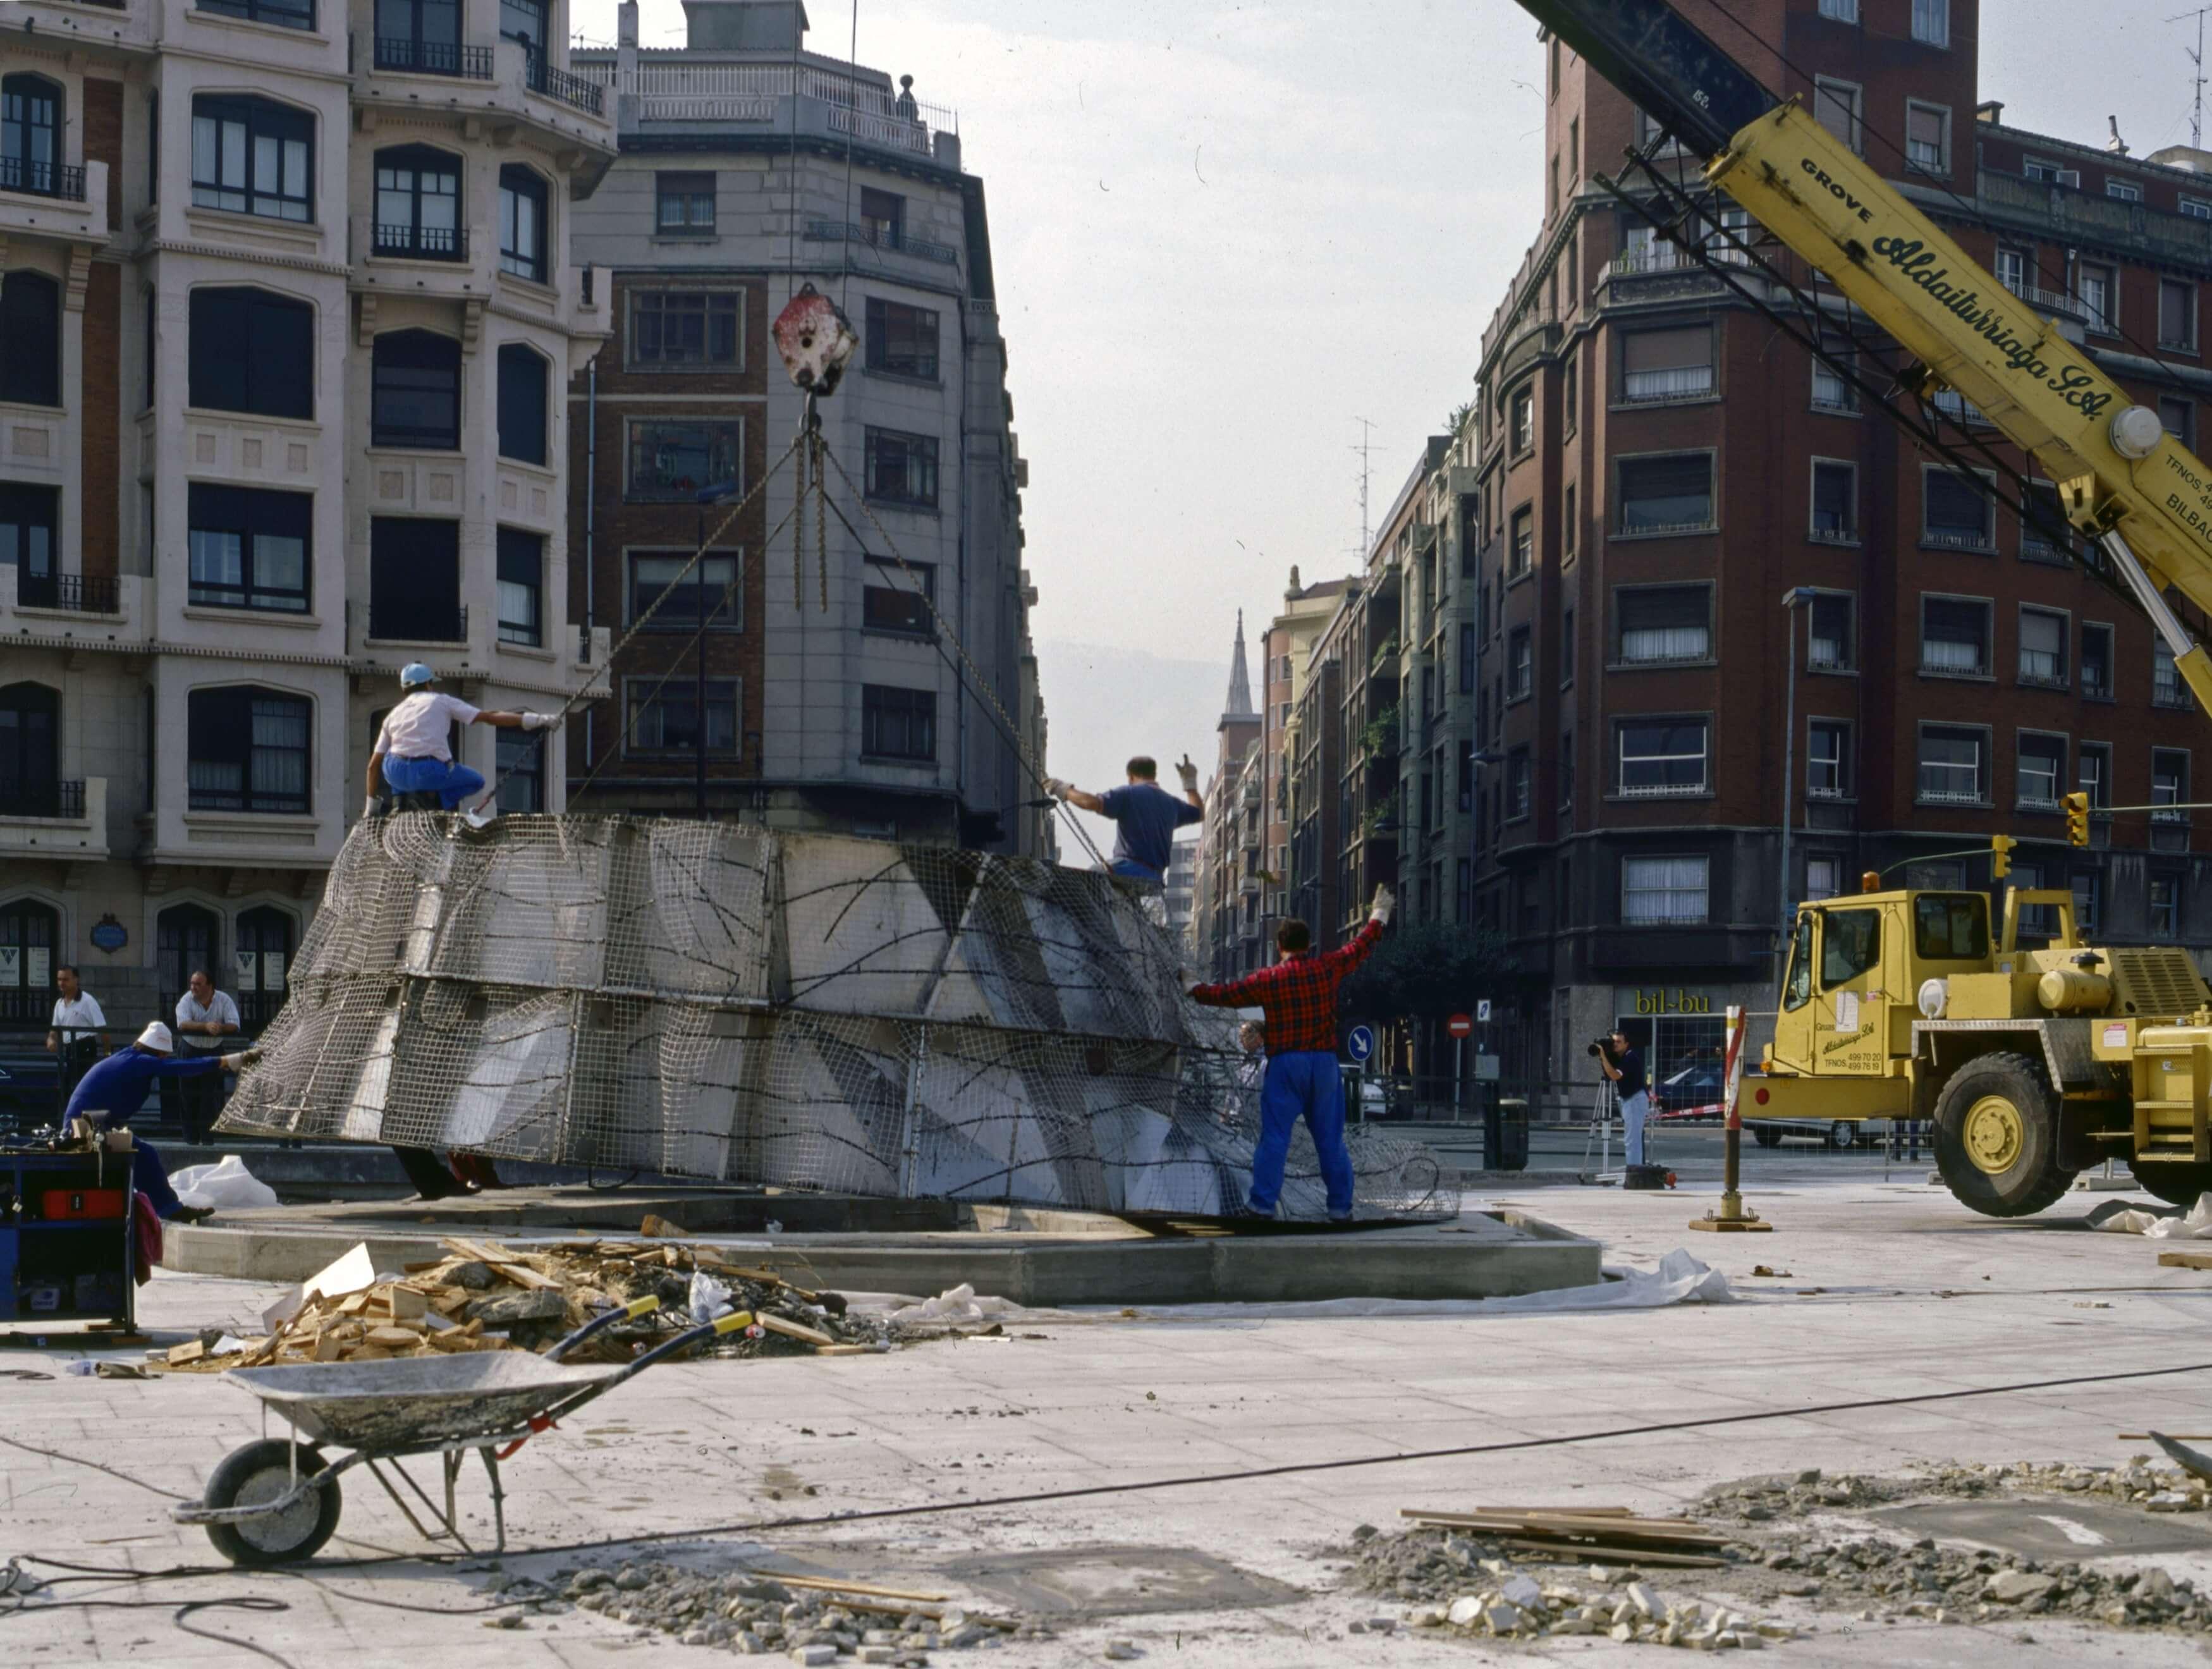 Starts Puppy's construction | Jeff Koons | Guggenheim Bilbao Museoa